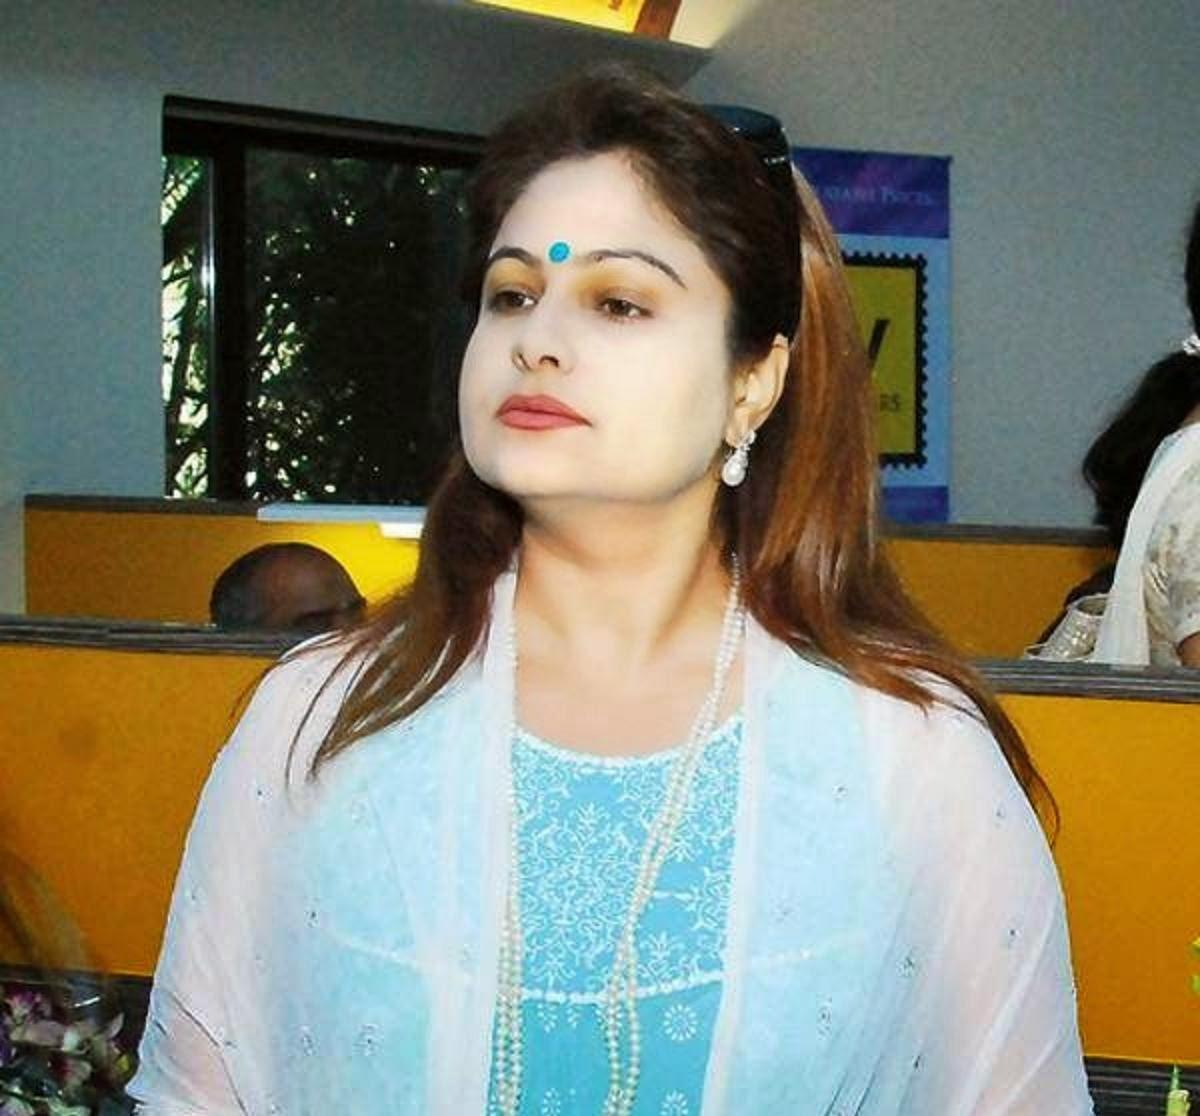 Nude Ayesha Jhulka 12 Pictures Boobs, Youtube-5999